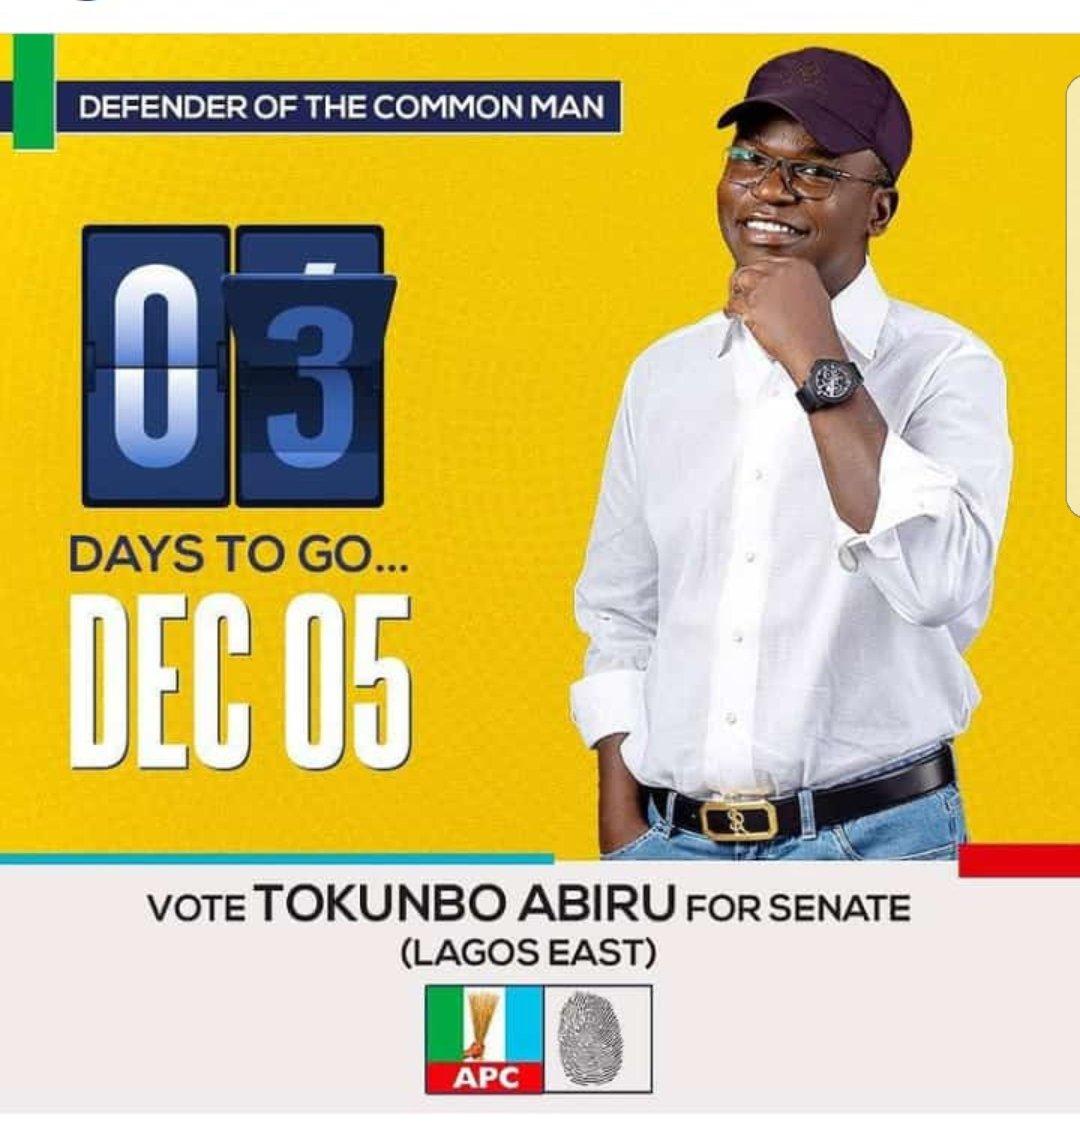 #tokunboabiru #tact #senate #lagos #Nigerian #Nigerians #lagoseastdebates #lagoseastdecides #nigerianyouths https://t.co/jhb3Z2mlYl